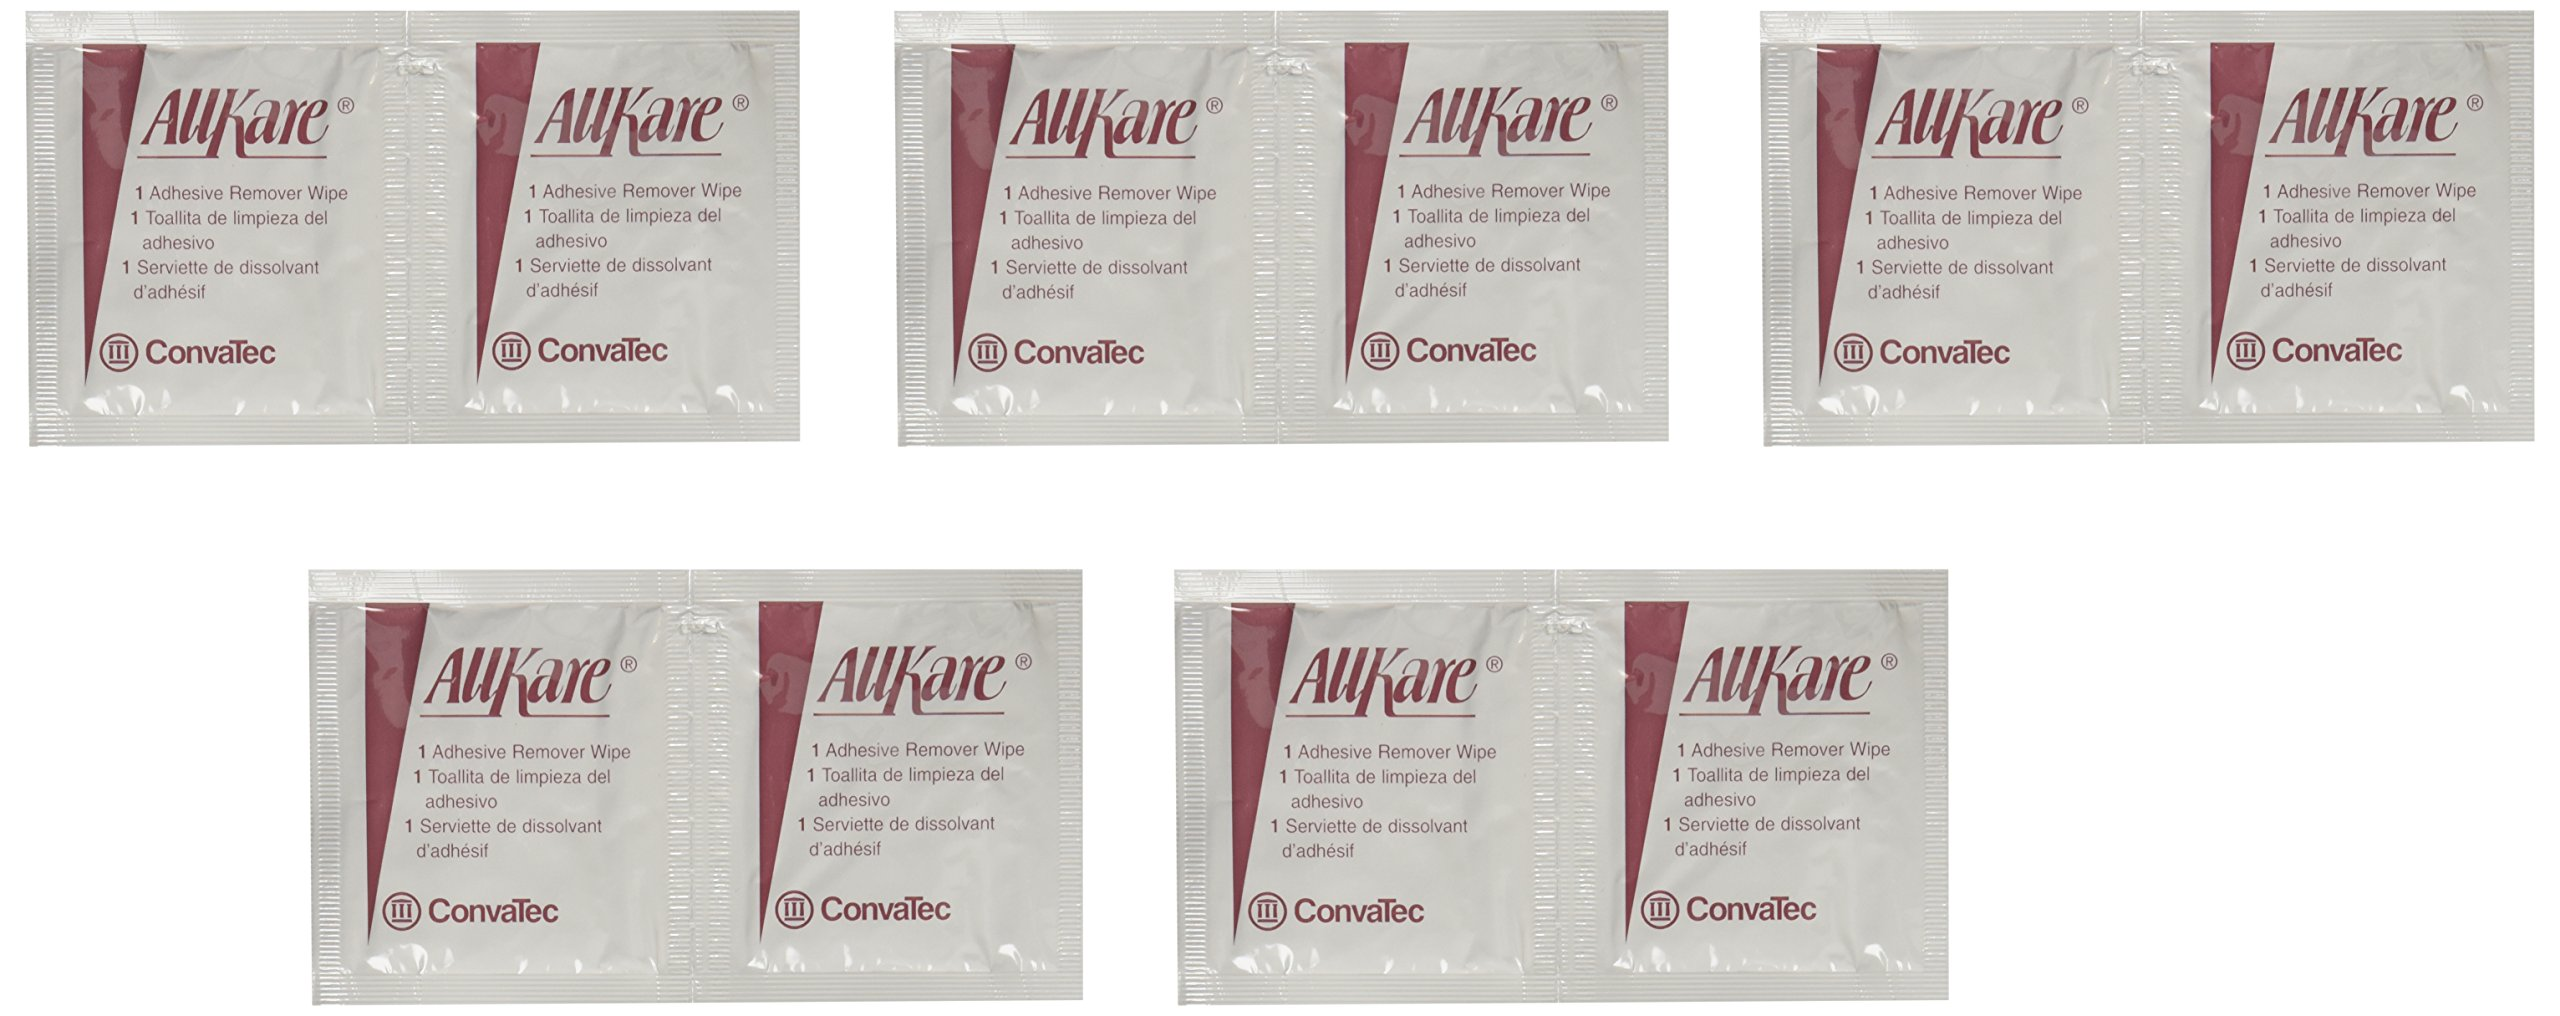 AllKare Adhesive Remover Wipe - 50 Pack